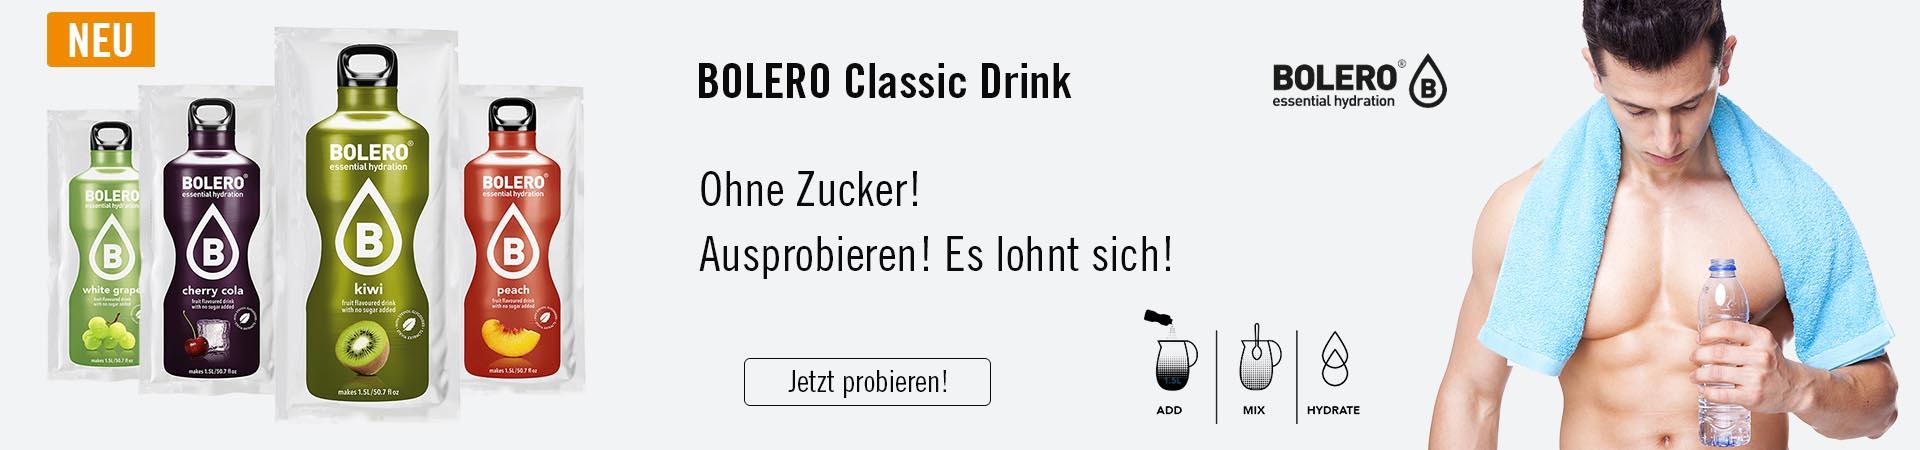 Bolero Classic Drink